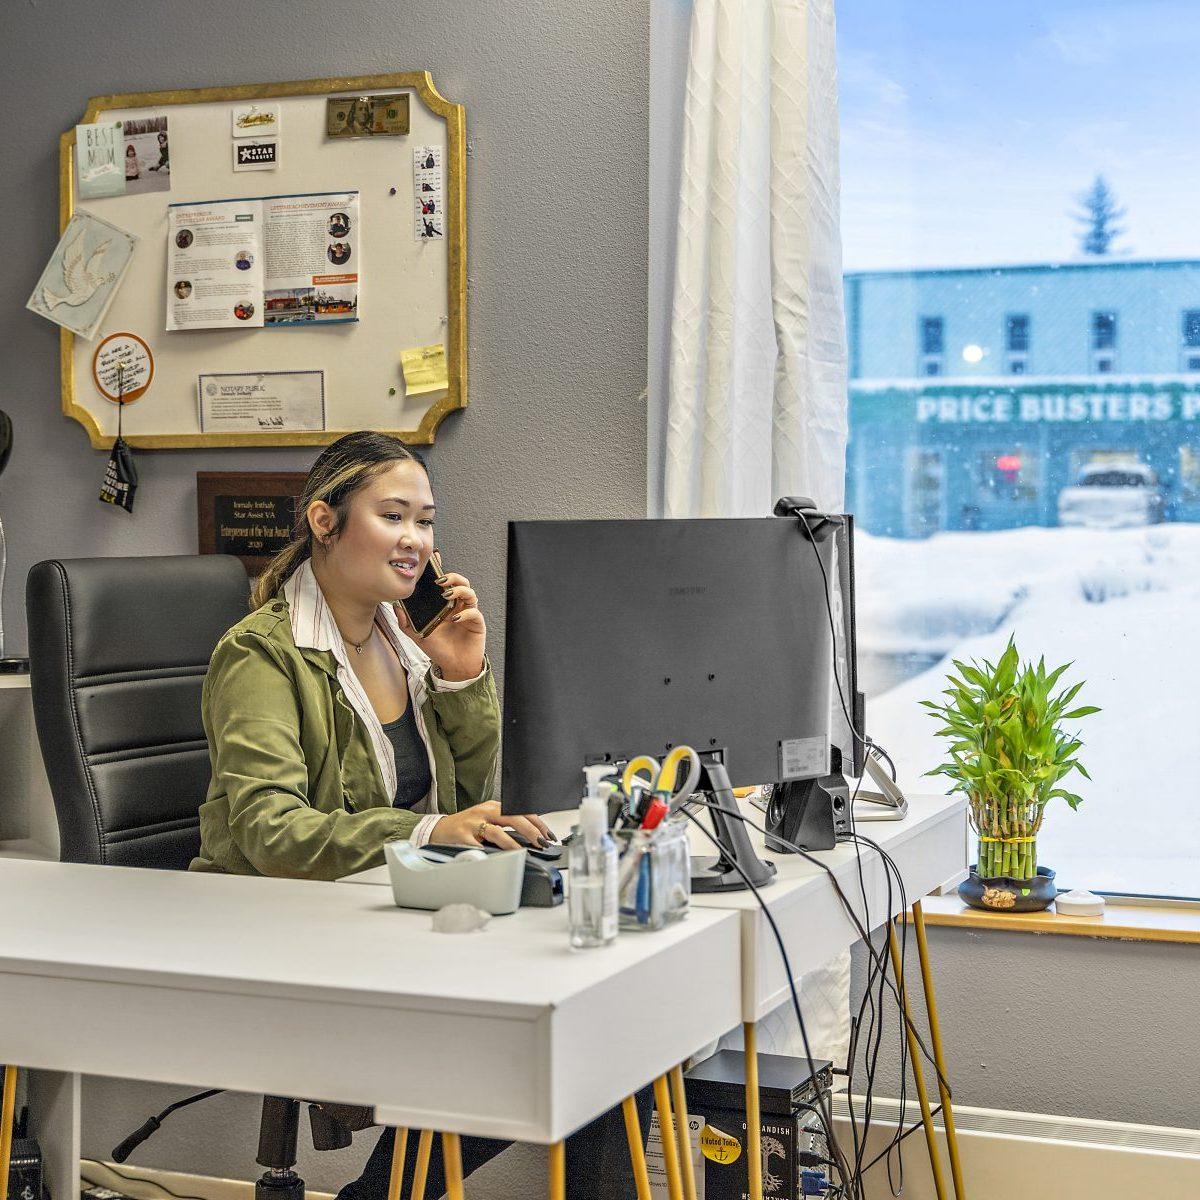 Star Assist - Doing business online